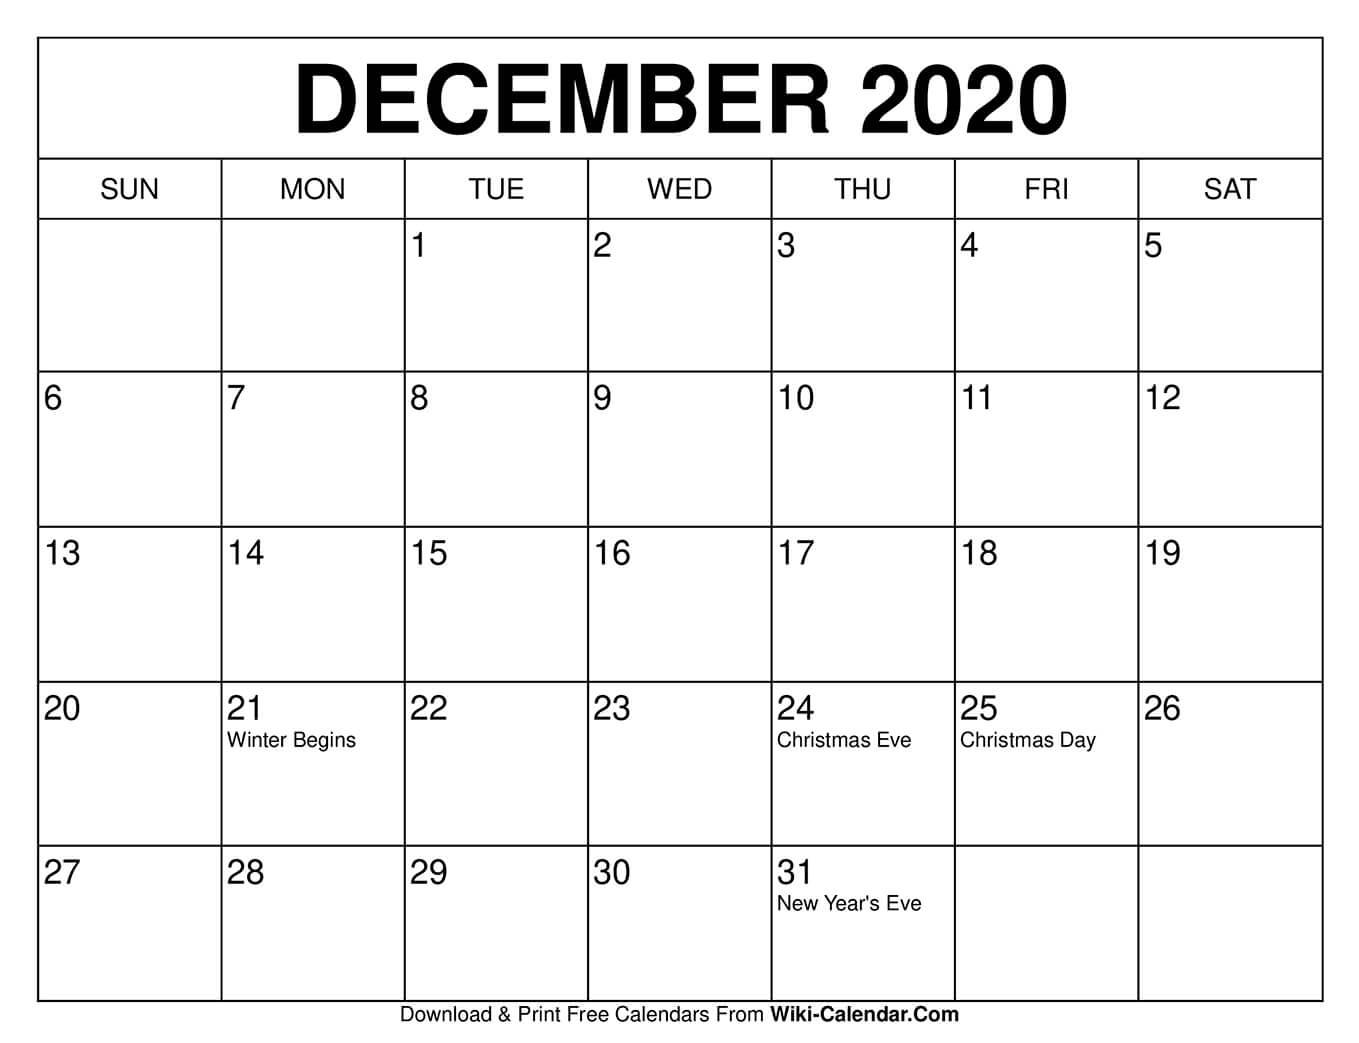 Printable Christmas Calendar 2020 Free Printable December 2020 Calendars